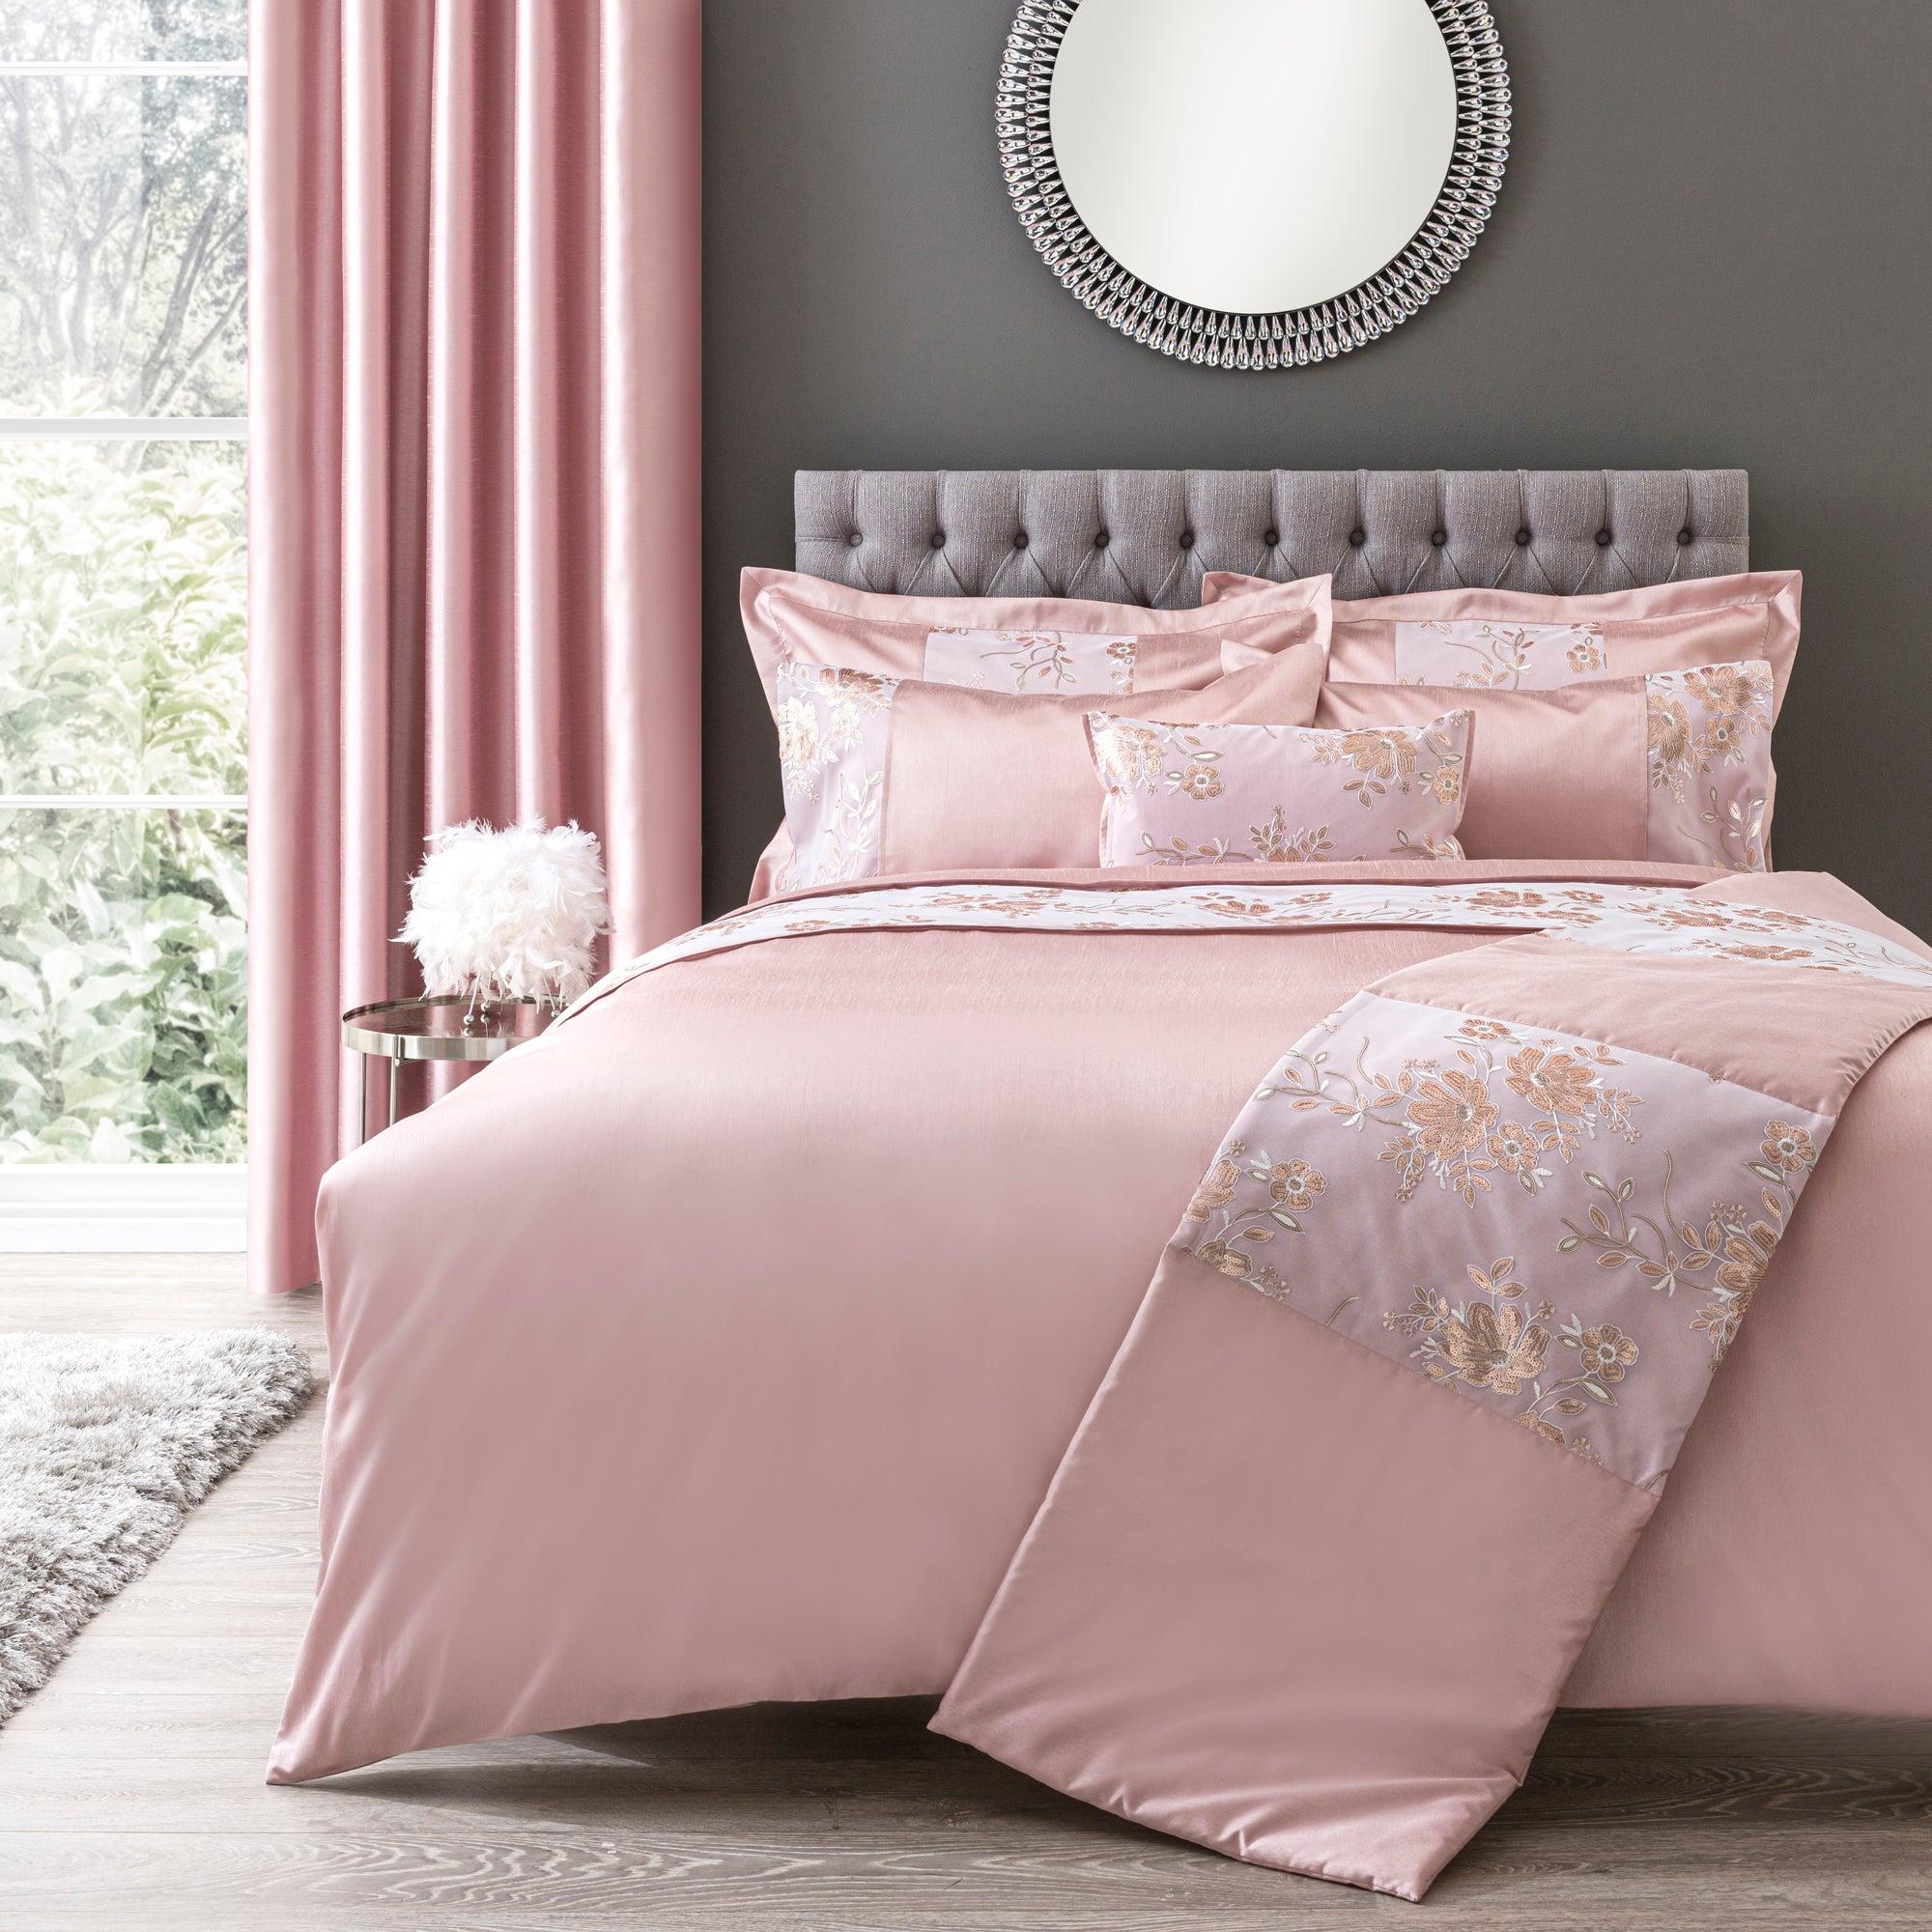 Dunelm Elene Pink Floral Sequin Duvet Cover and Pillowcase Set Pink Double